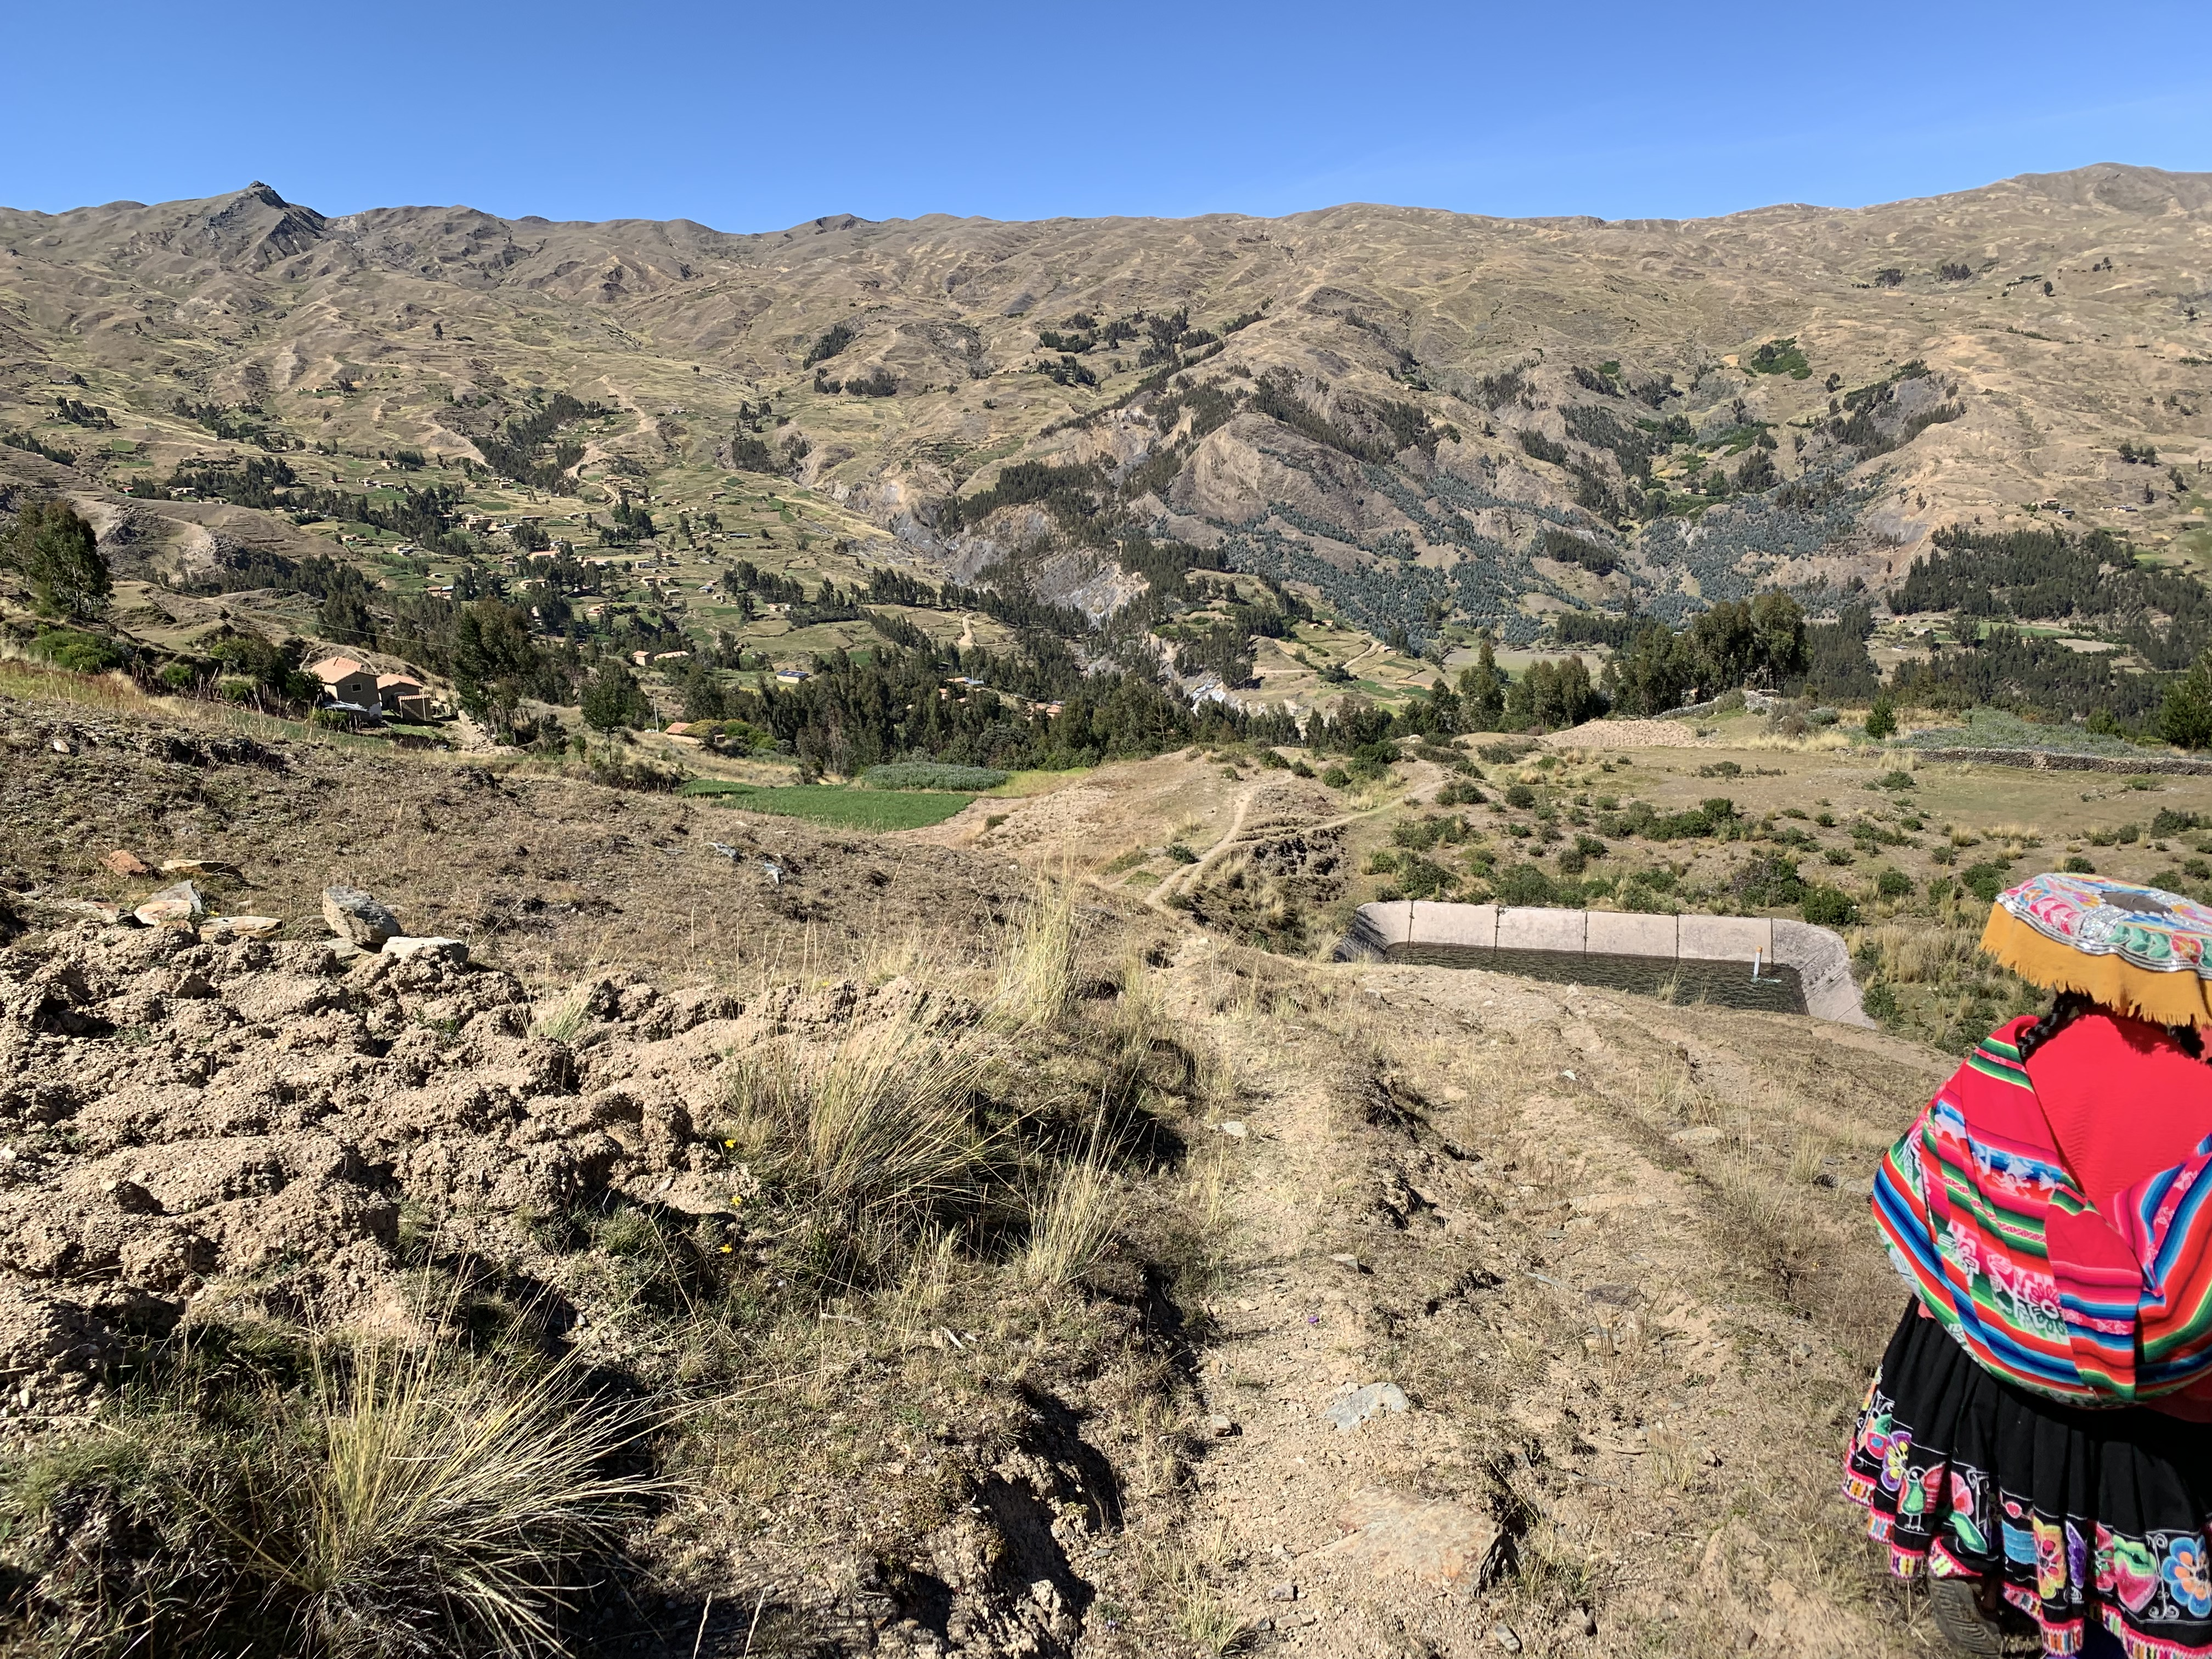 Campesina mentre scende lungo una collina, comunità di Callatiac